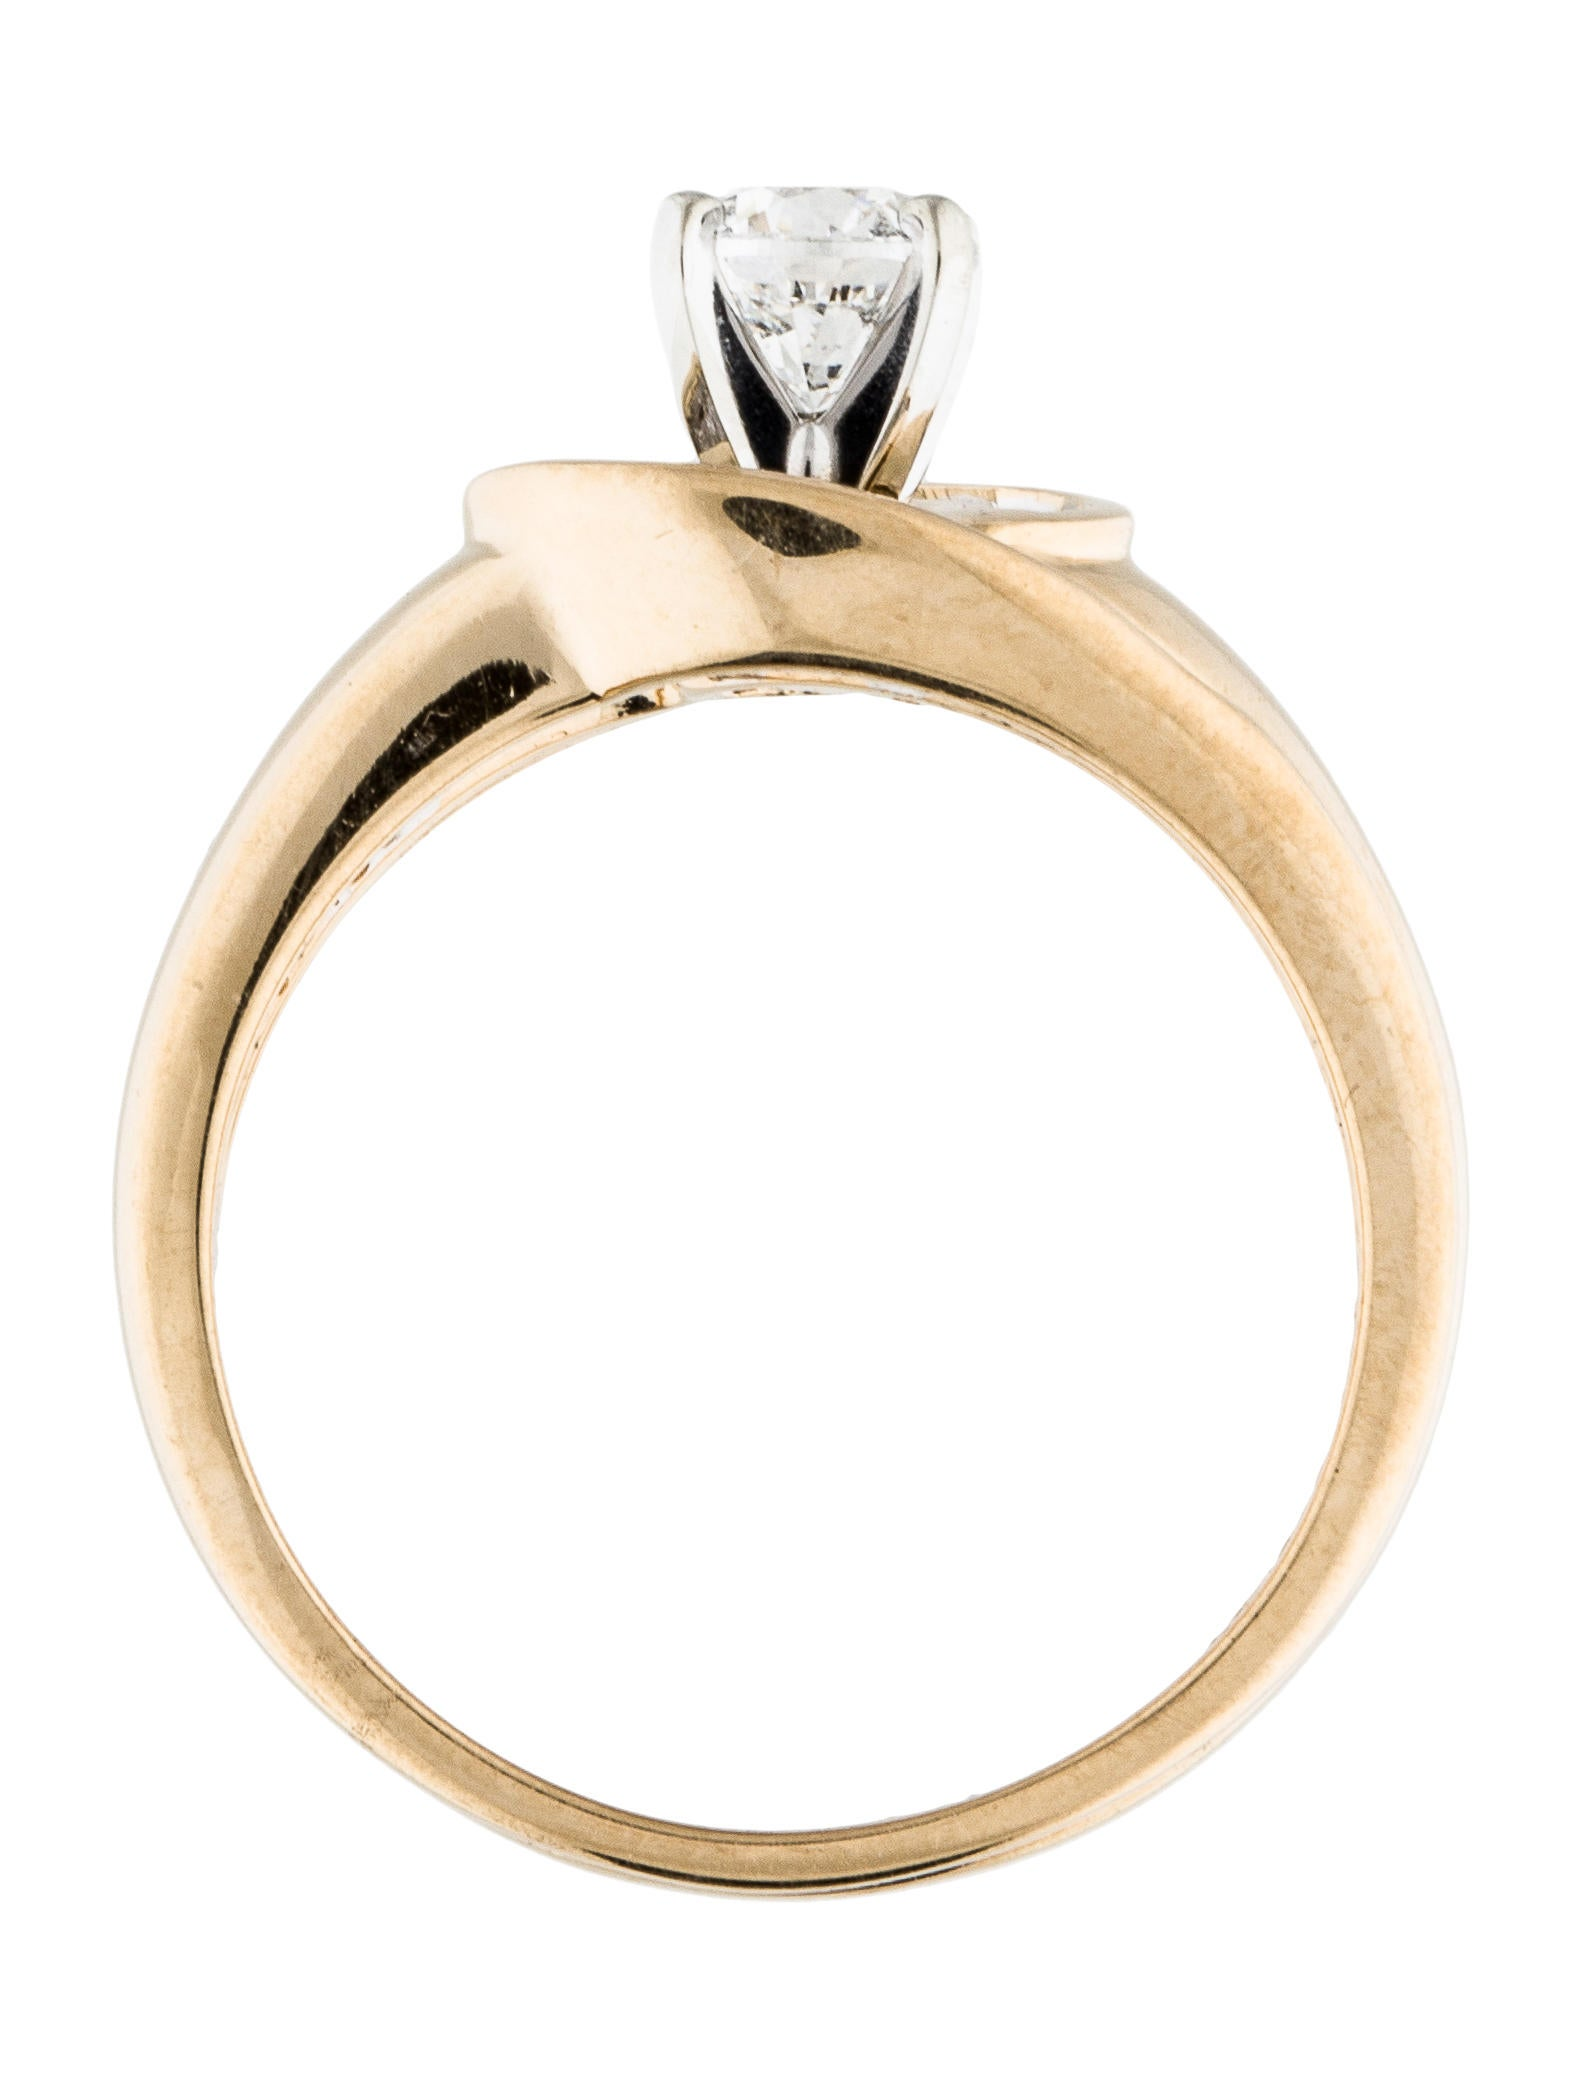 14K Round Brilliant & Baguette Diamond Wedding Ring Set Rings